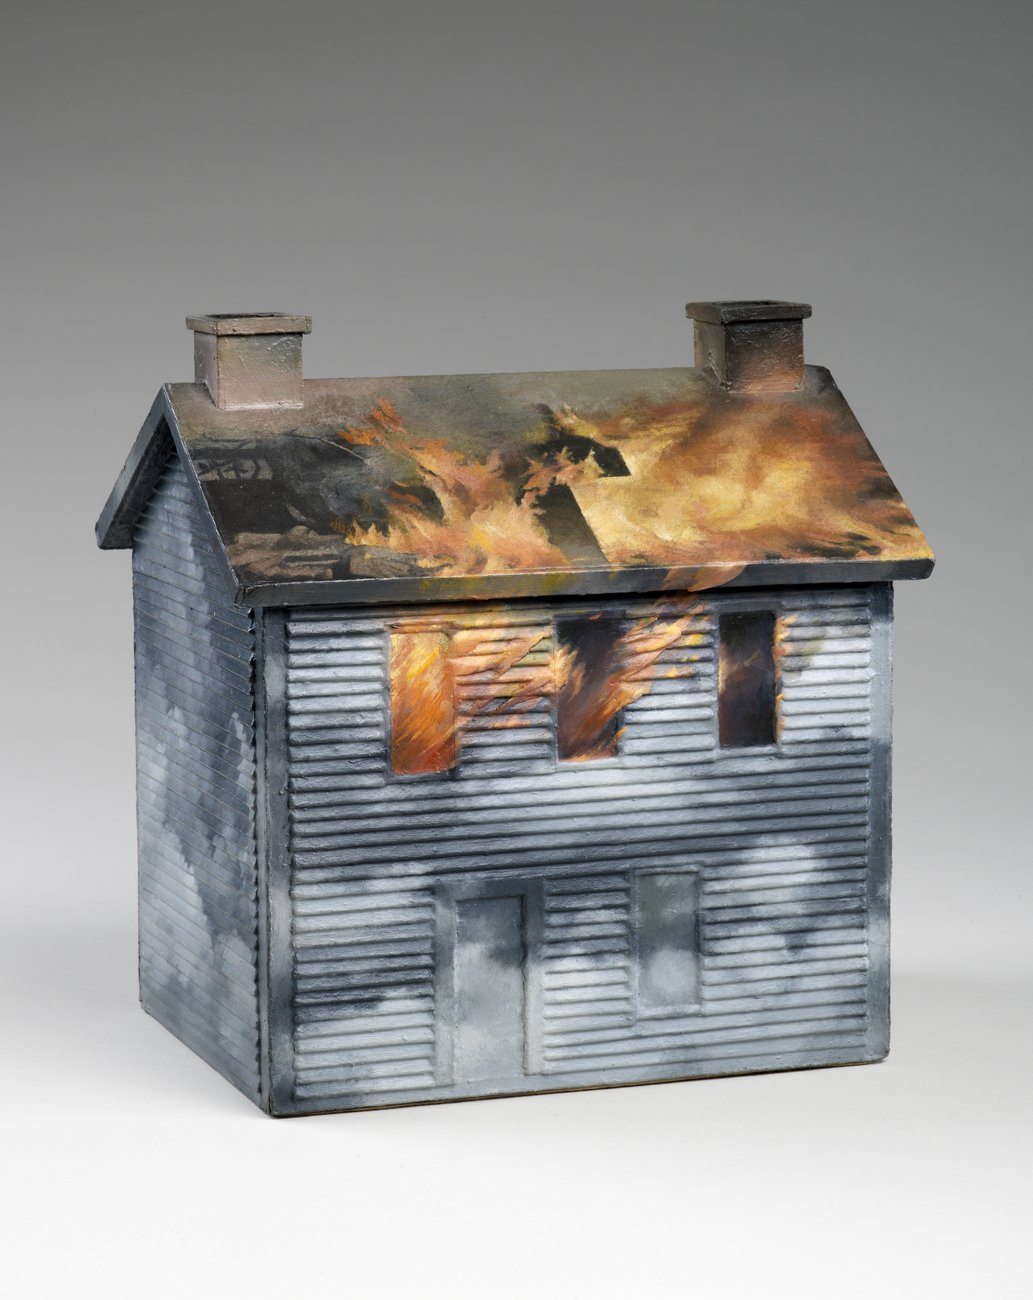 cardboard and wooden sculpture of a house on fire, Vija Celmins